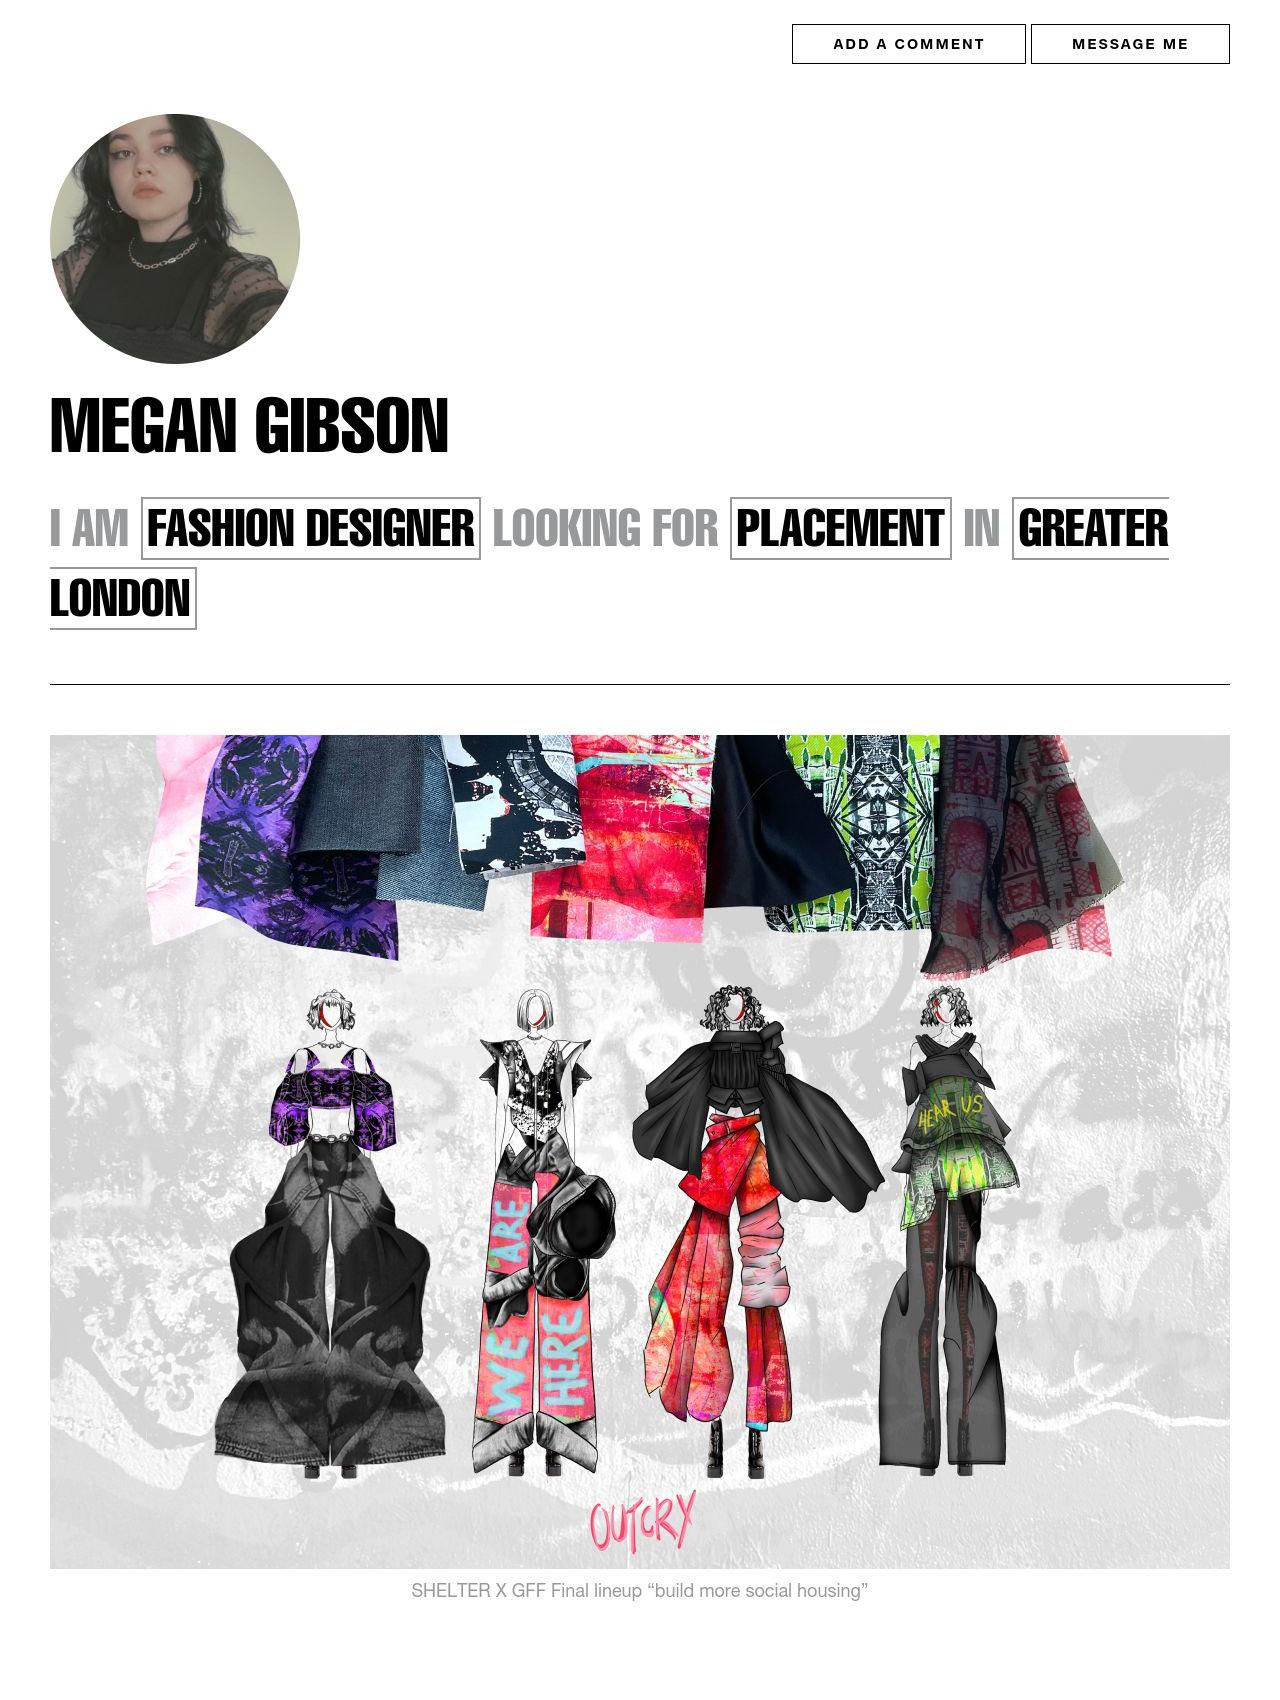 Megan Gibson